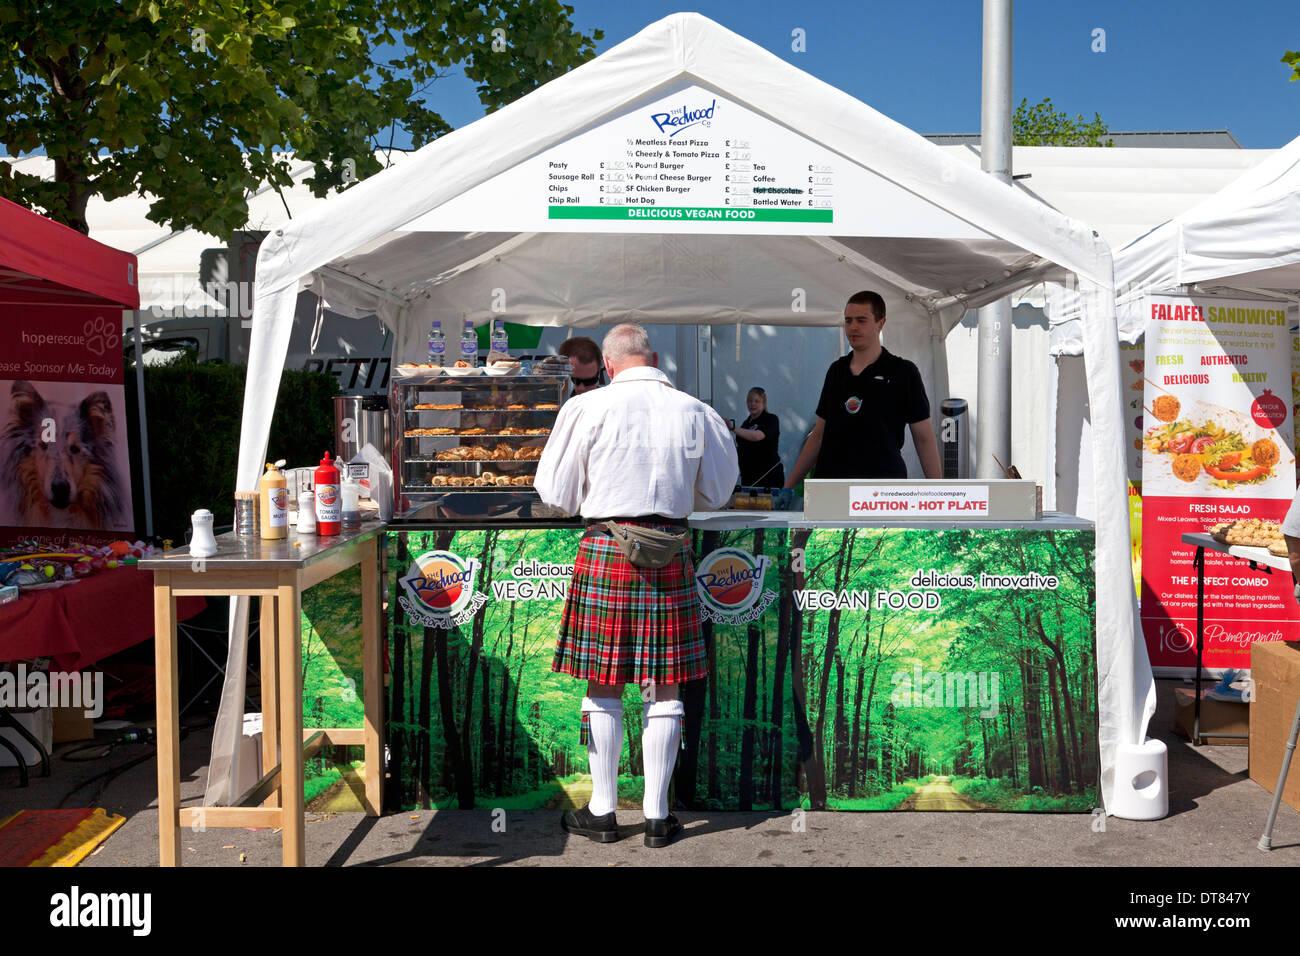 man-in-kilt-at-food-stall-at-bristol-veg